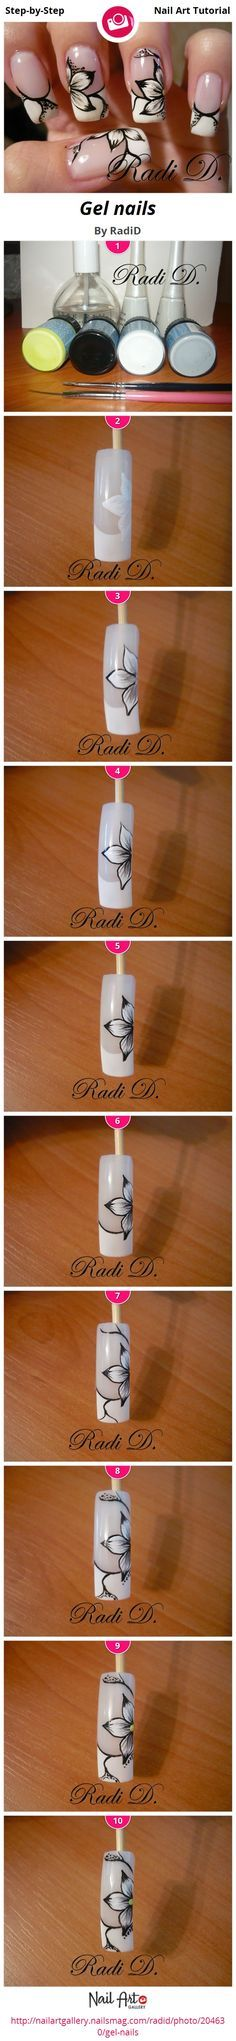 Gel nails by RadiD - Nail Art Gallery Step-by-Step Tutorials ...